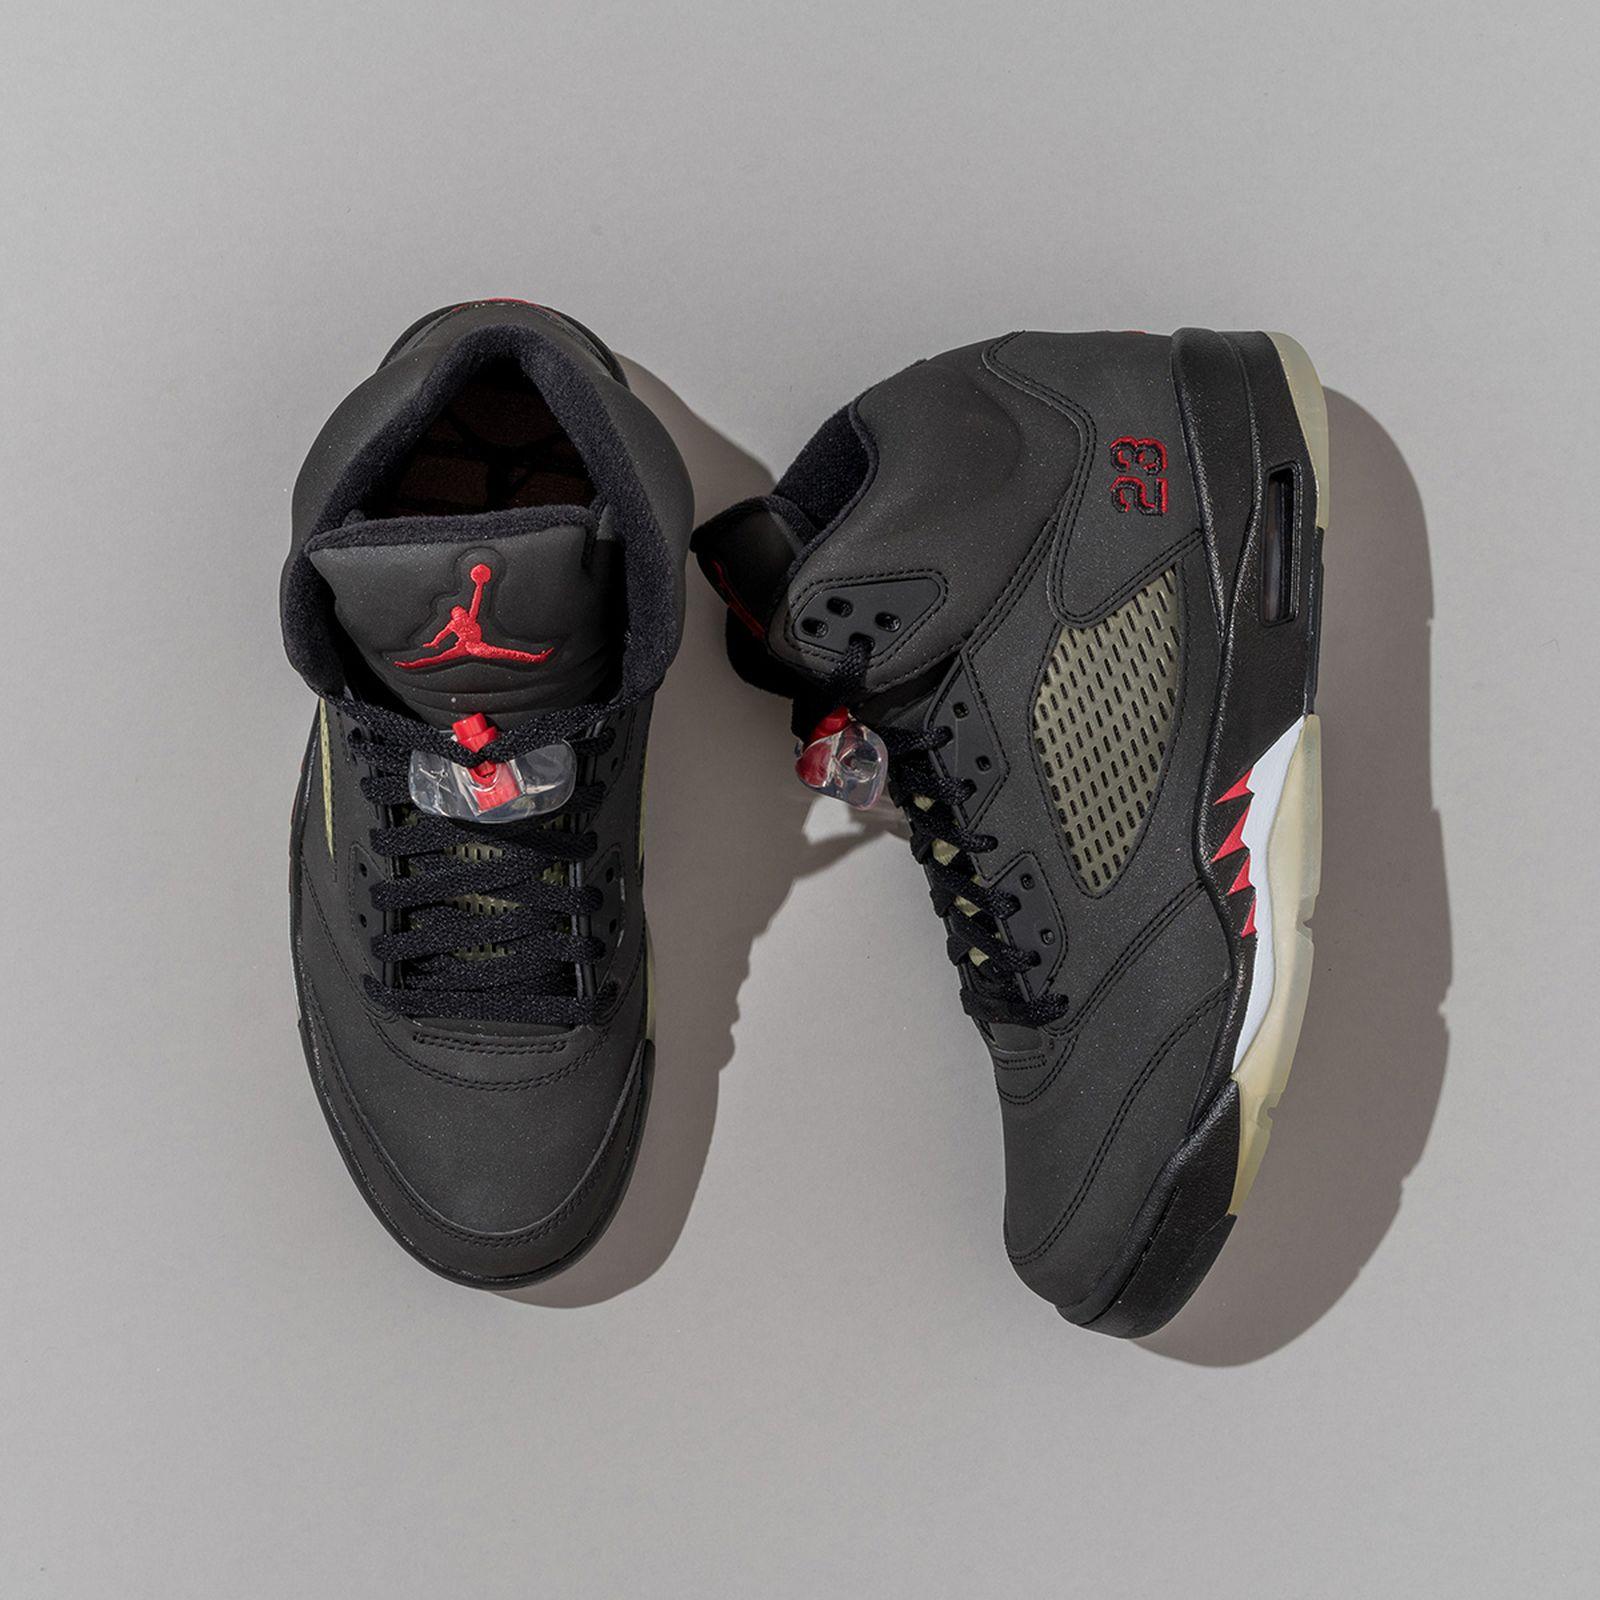 brad-hogan-jordan-sneaker-collection-02 2